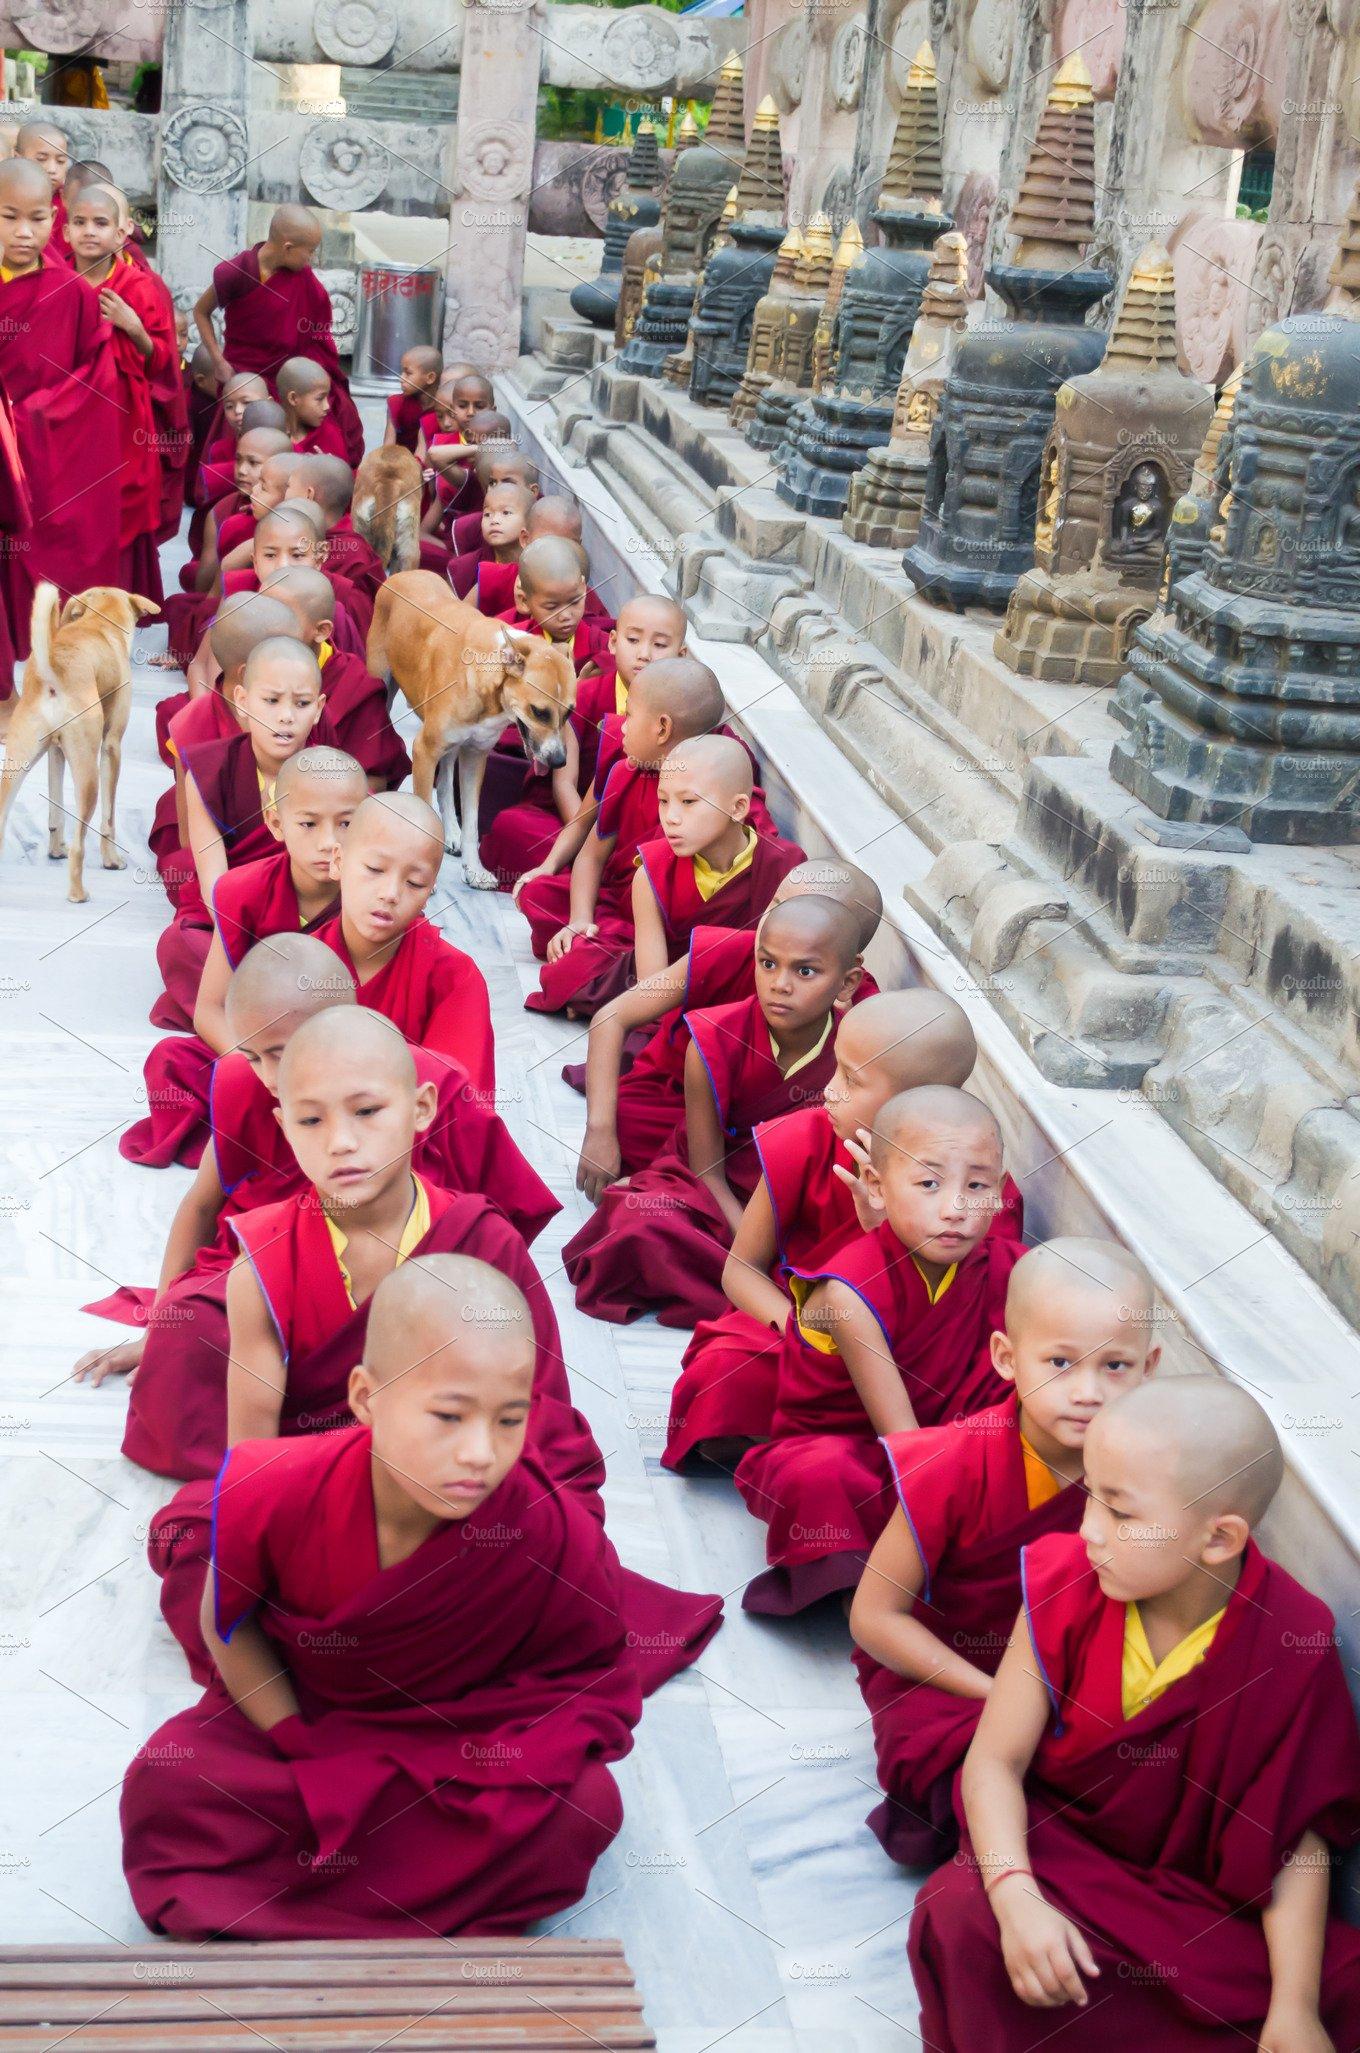 Tibet Novice Monks in India ~ People Photos ~ Creative Market